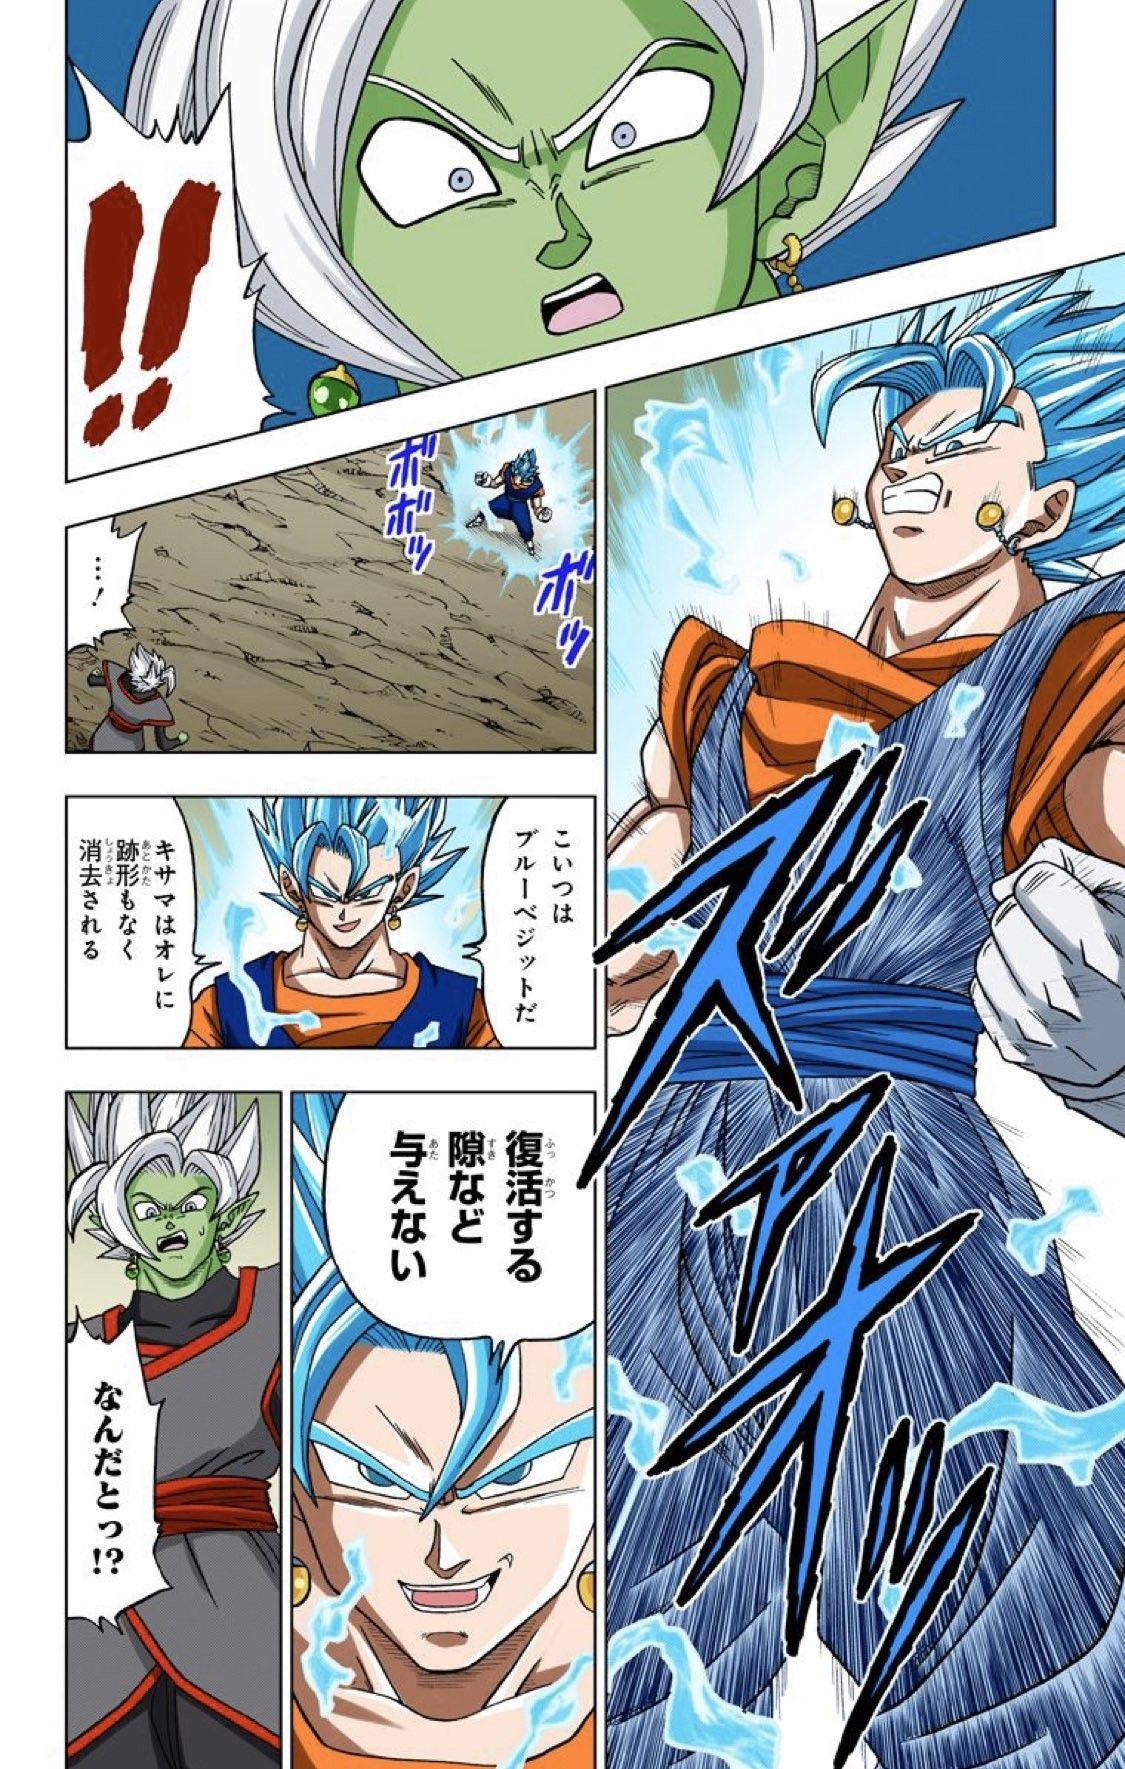 Vegito Ssgss Dbs Mangá Dragon Ball Super Dragon Ball Image Dragon Ball Super Manga